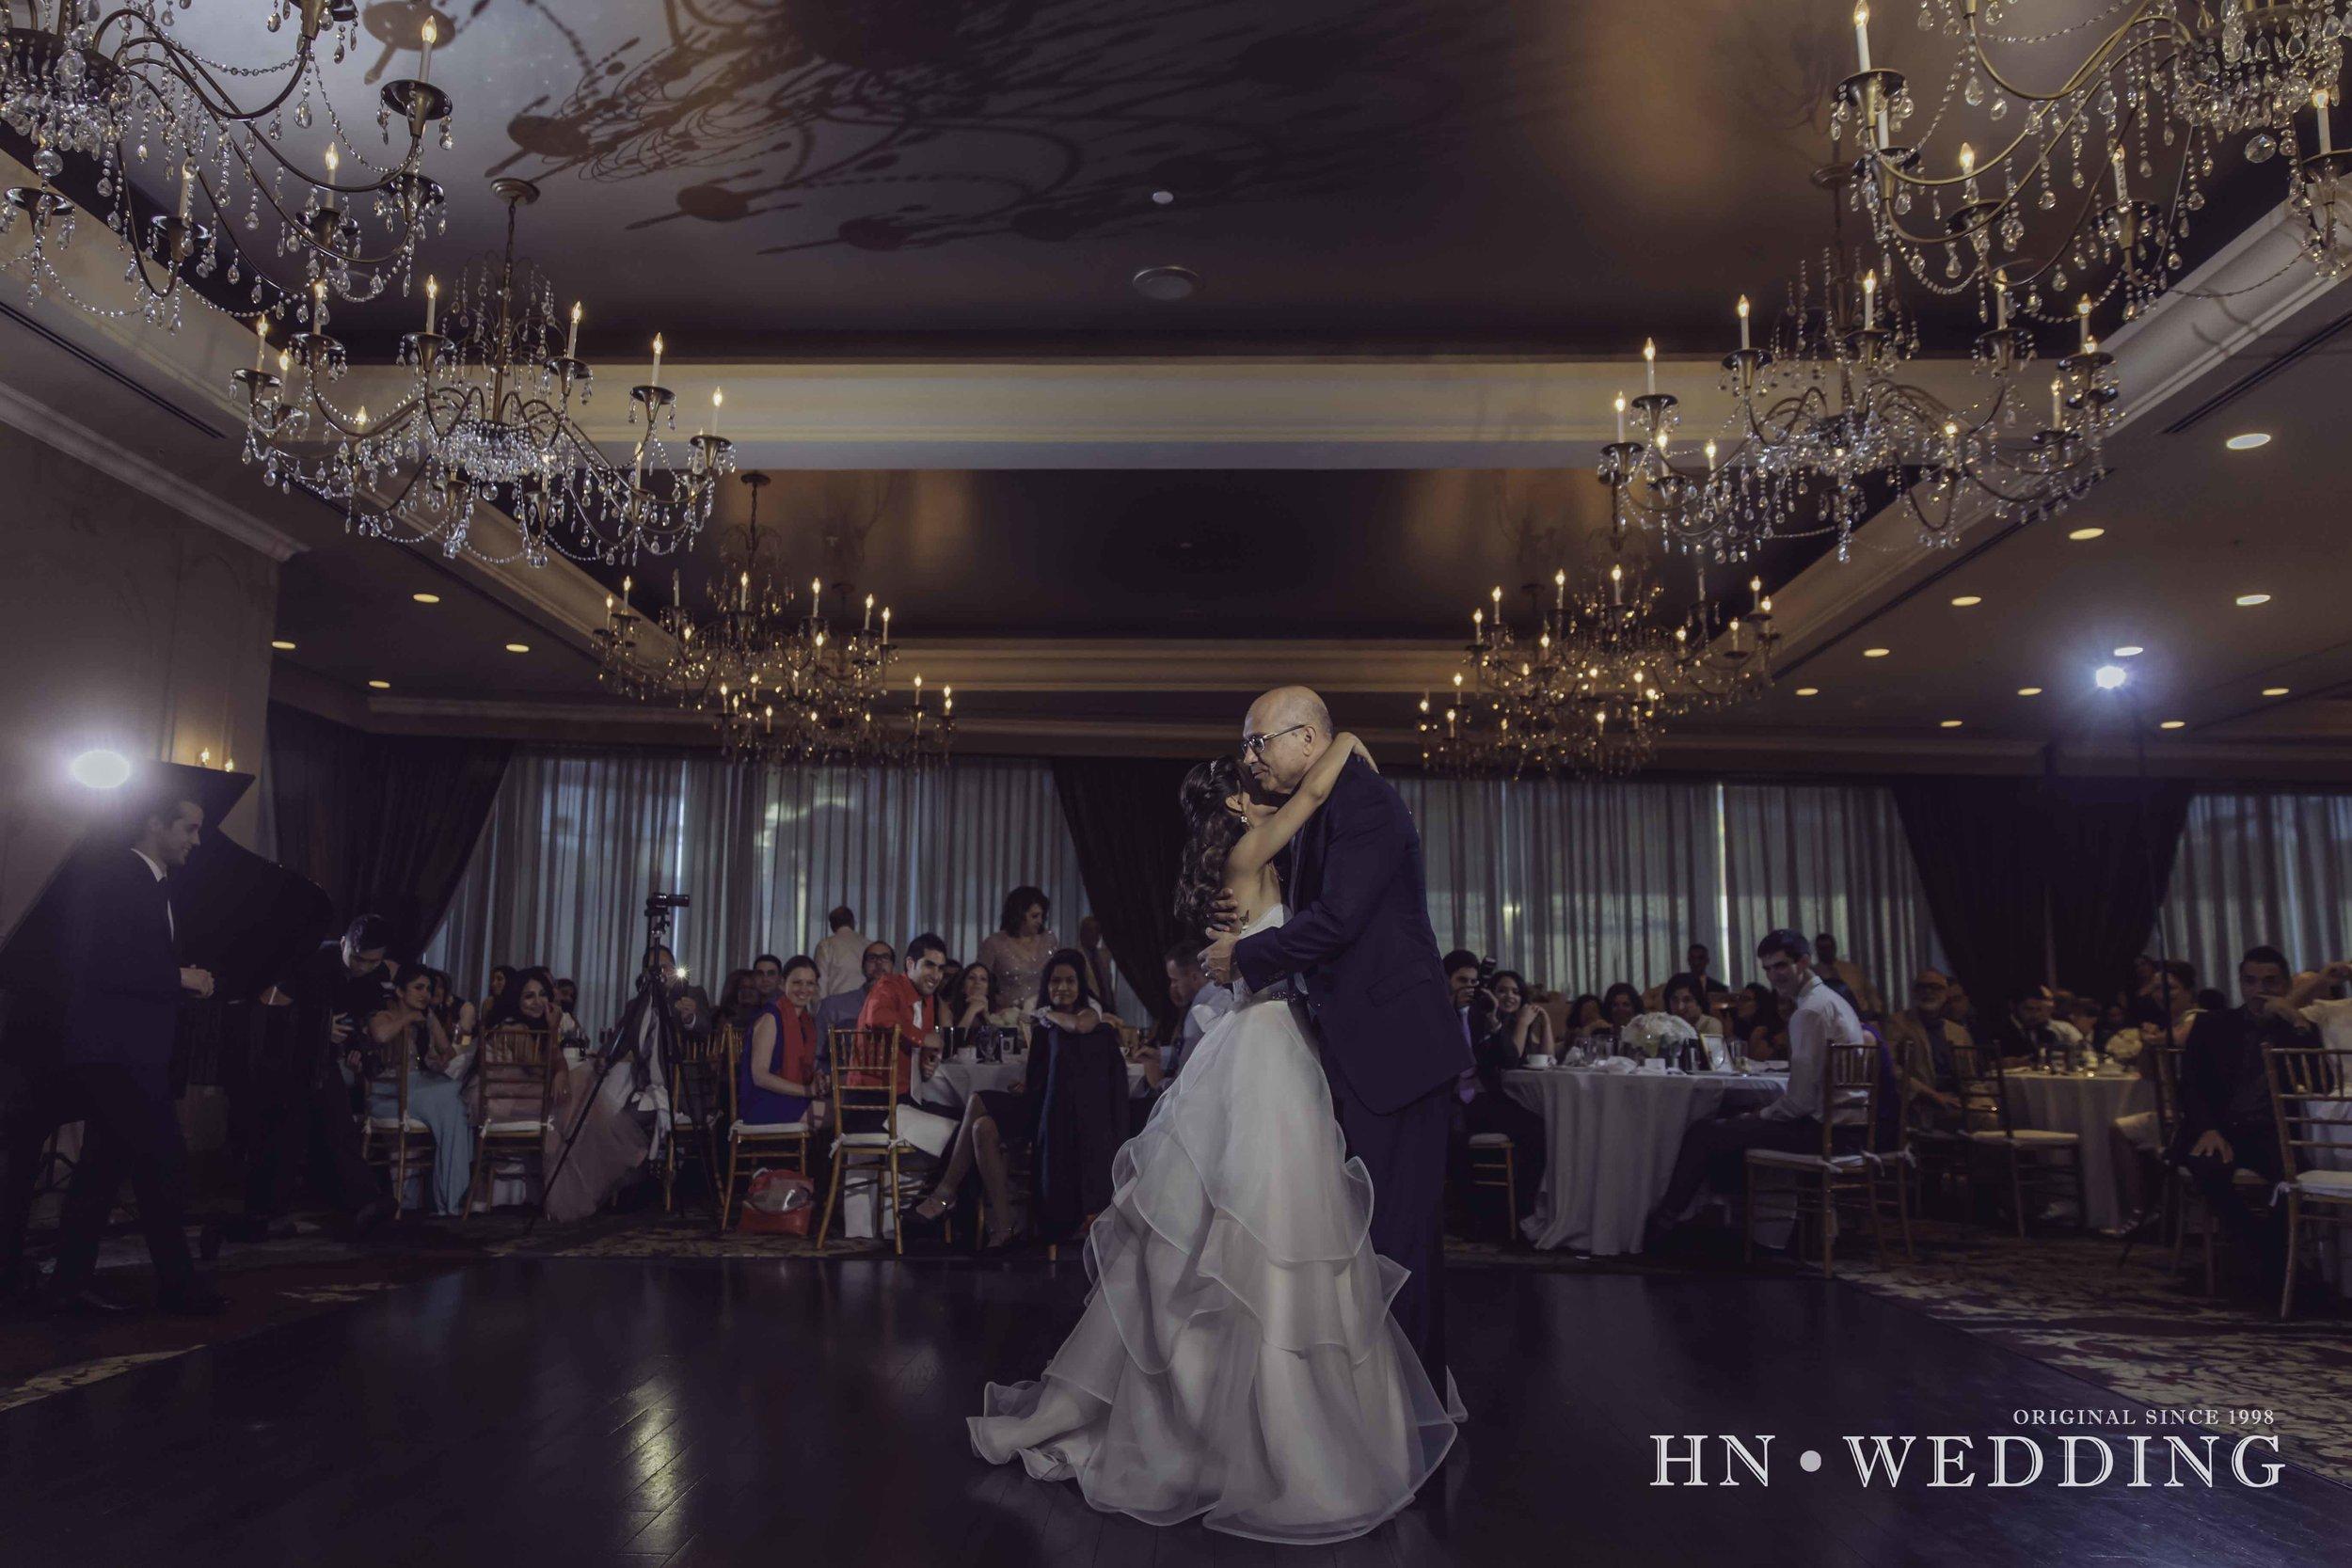 HNwedding-20161012-wedding-4939.jpg